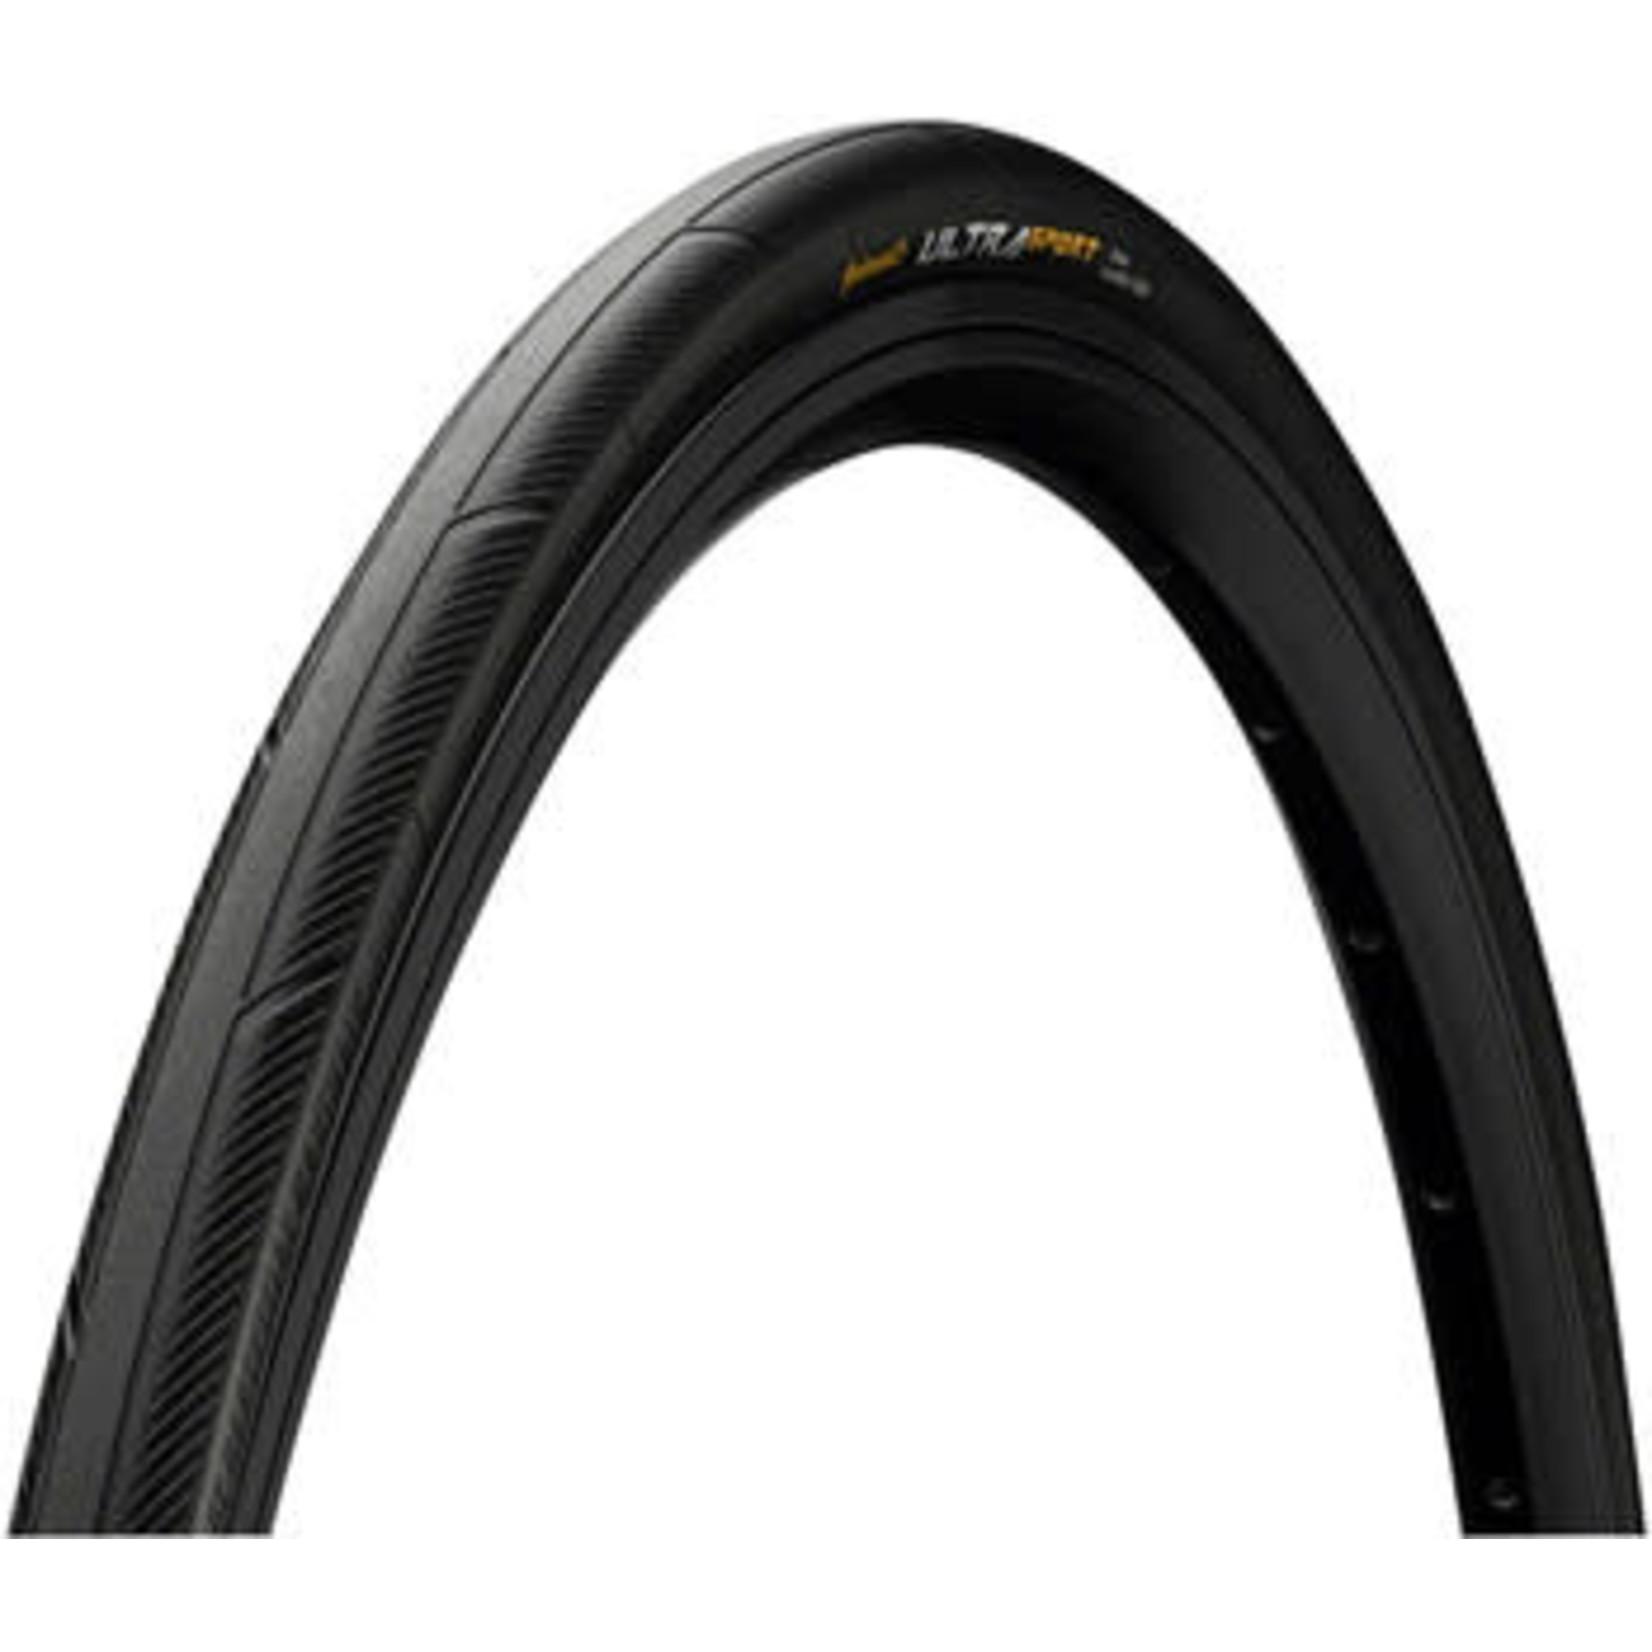 Conti Ultra Sport III 700x25 Clinch Folding